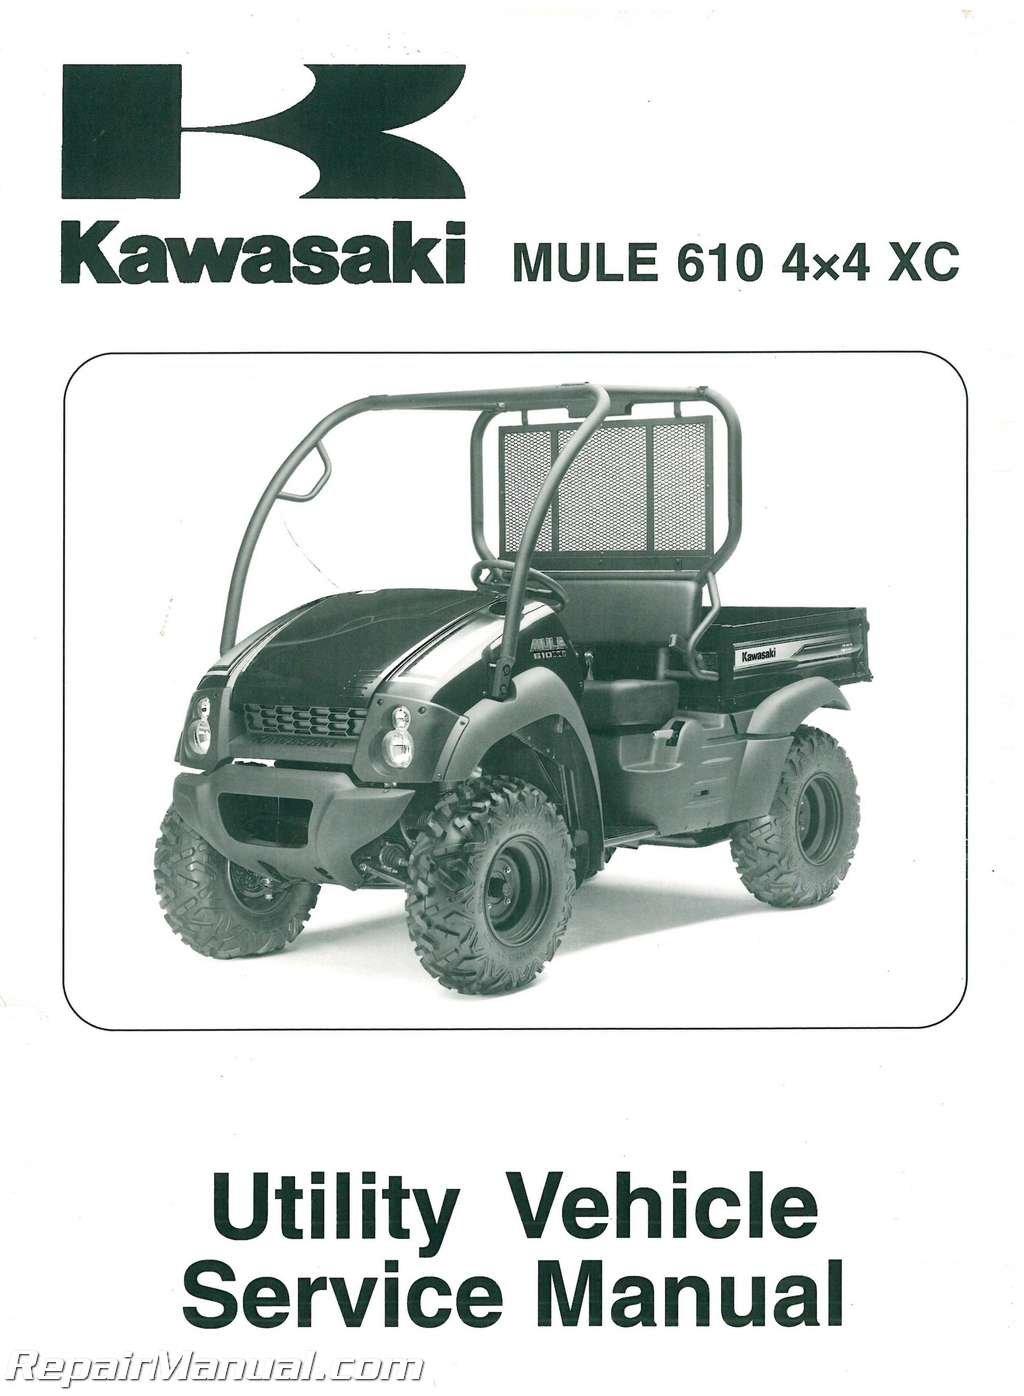 99924-1433-03 2010-2011 Kawasaki KAF400D Mule 610 4×4 XC Service Manual:  Manufacturer: Amazon.com: Books